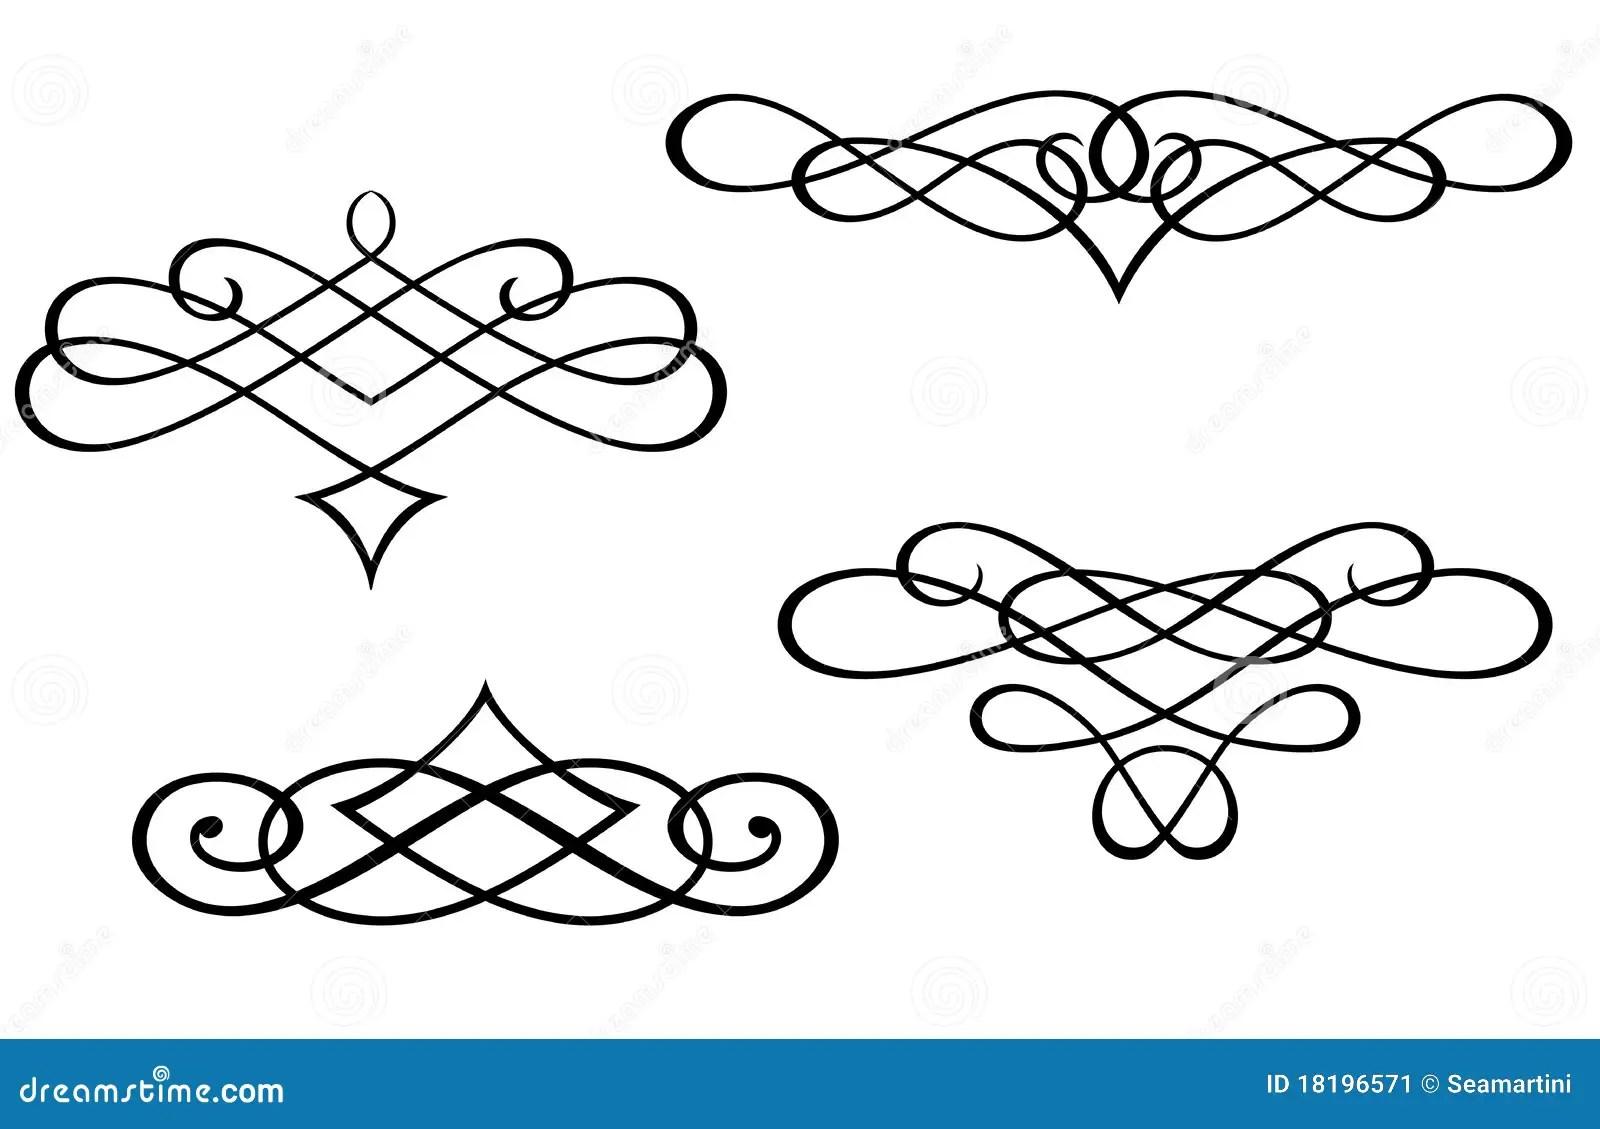 Monograms And Swirl Elements Stock Image